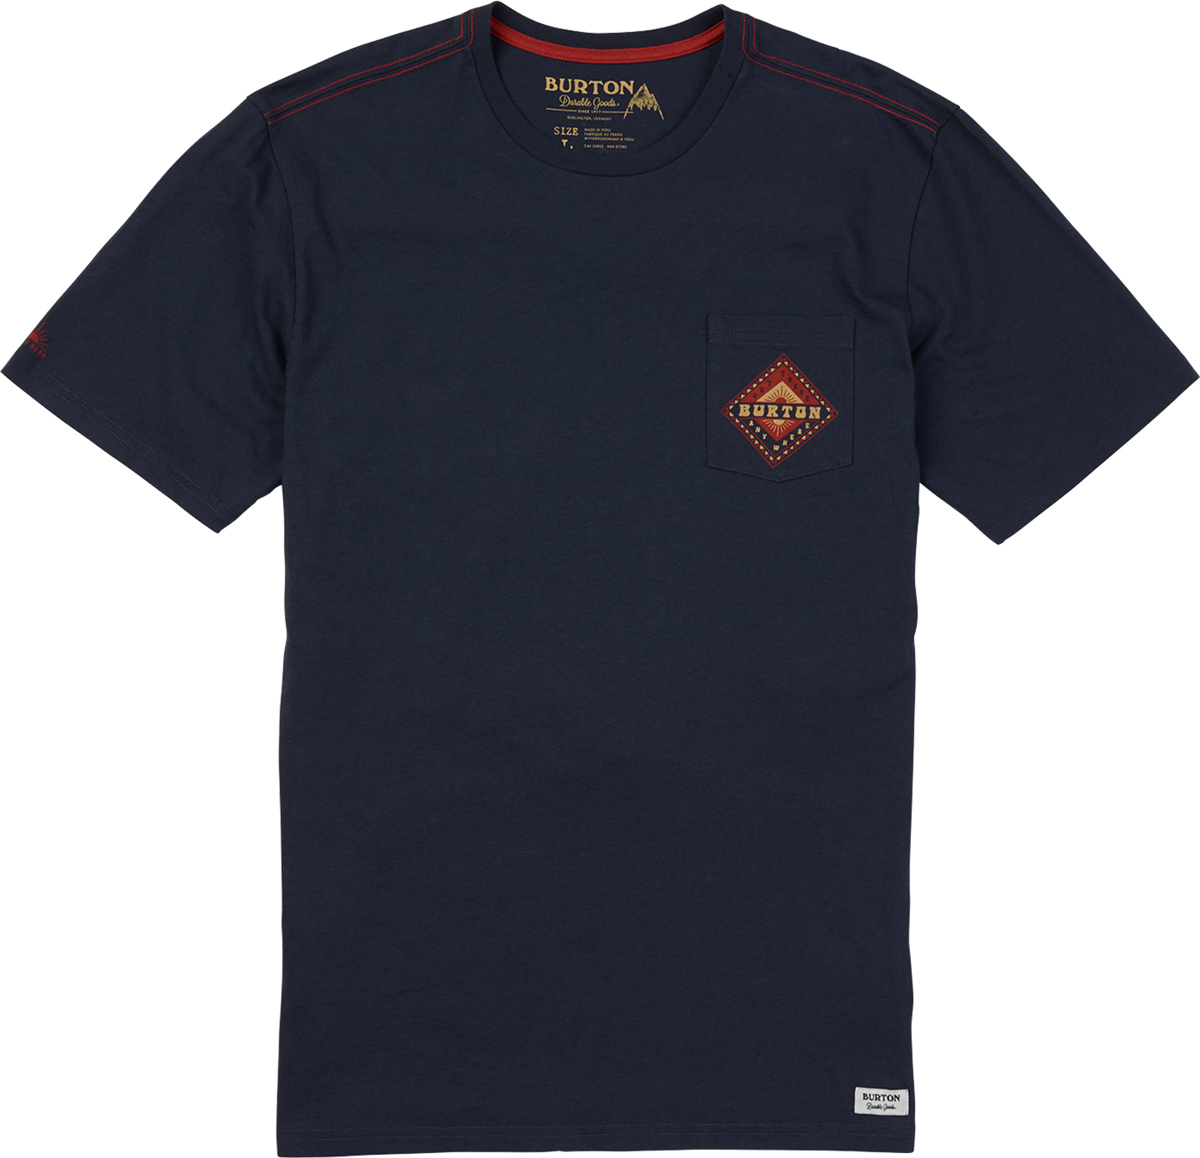 Футболка мужская Burton Mb Anchor Point Ss, цвет: темно-синий. 19694100400. Размер XXL (54) burton футболка